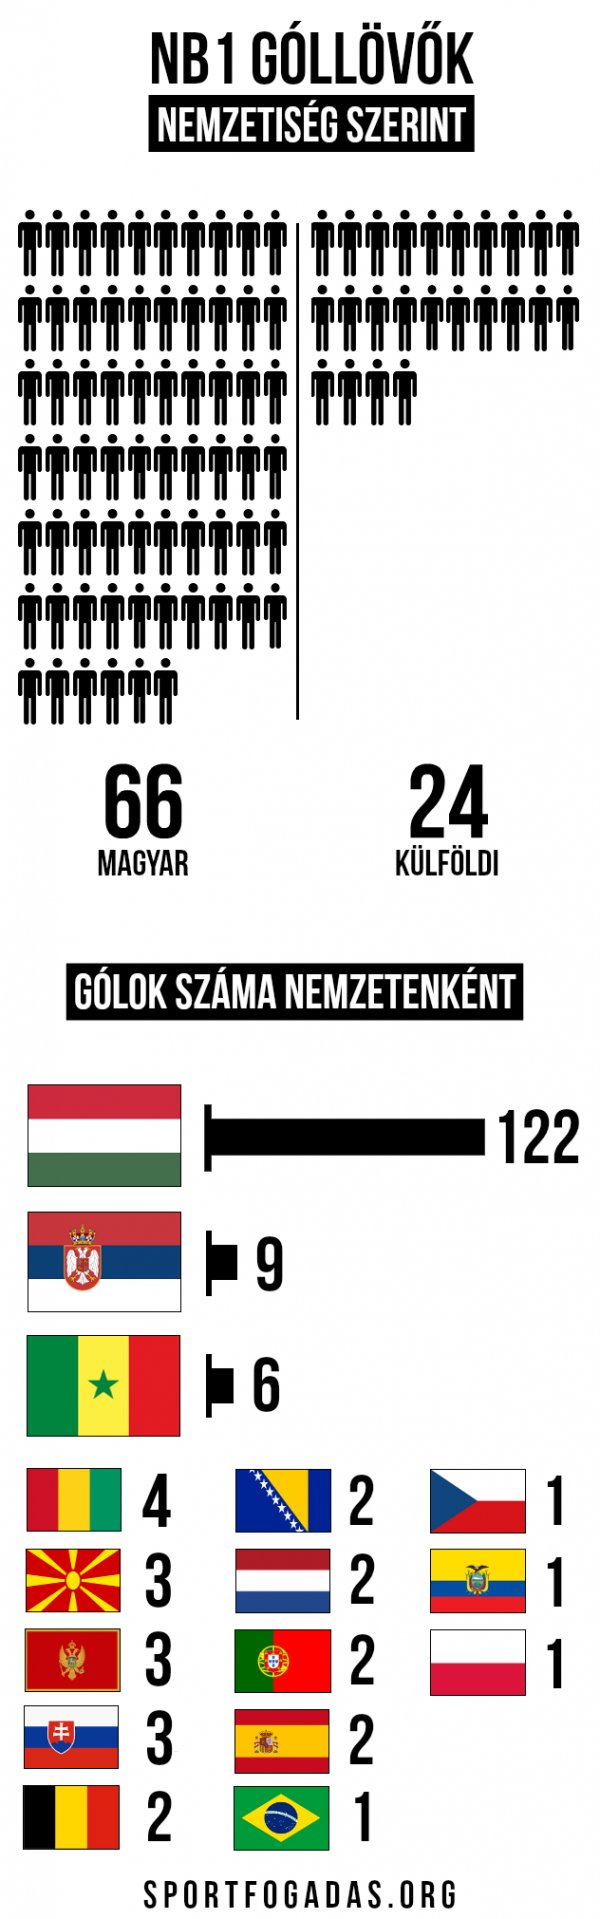 nb1 statisztika